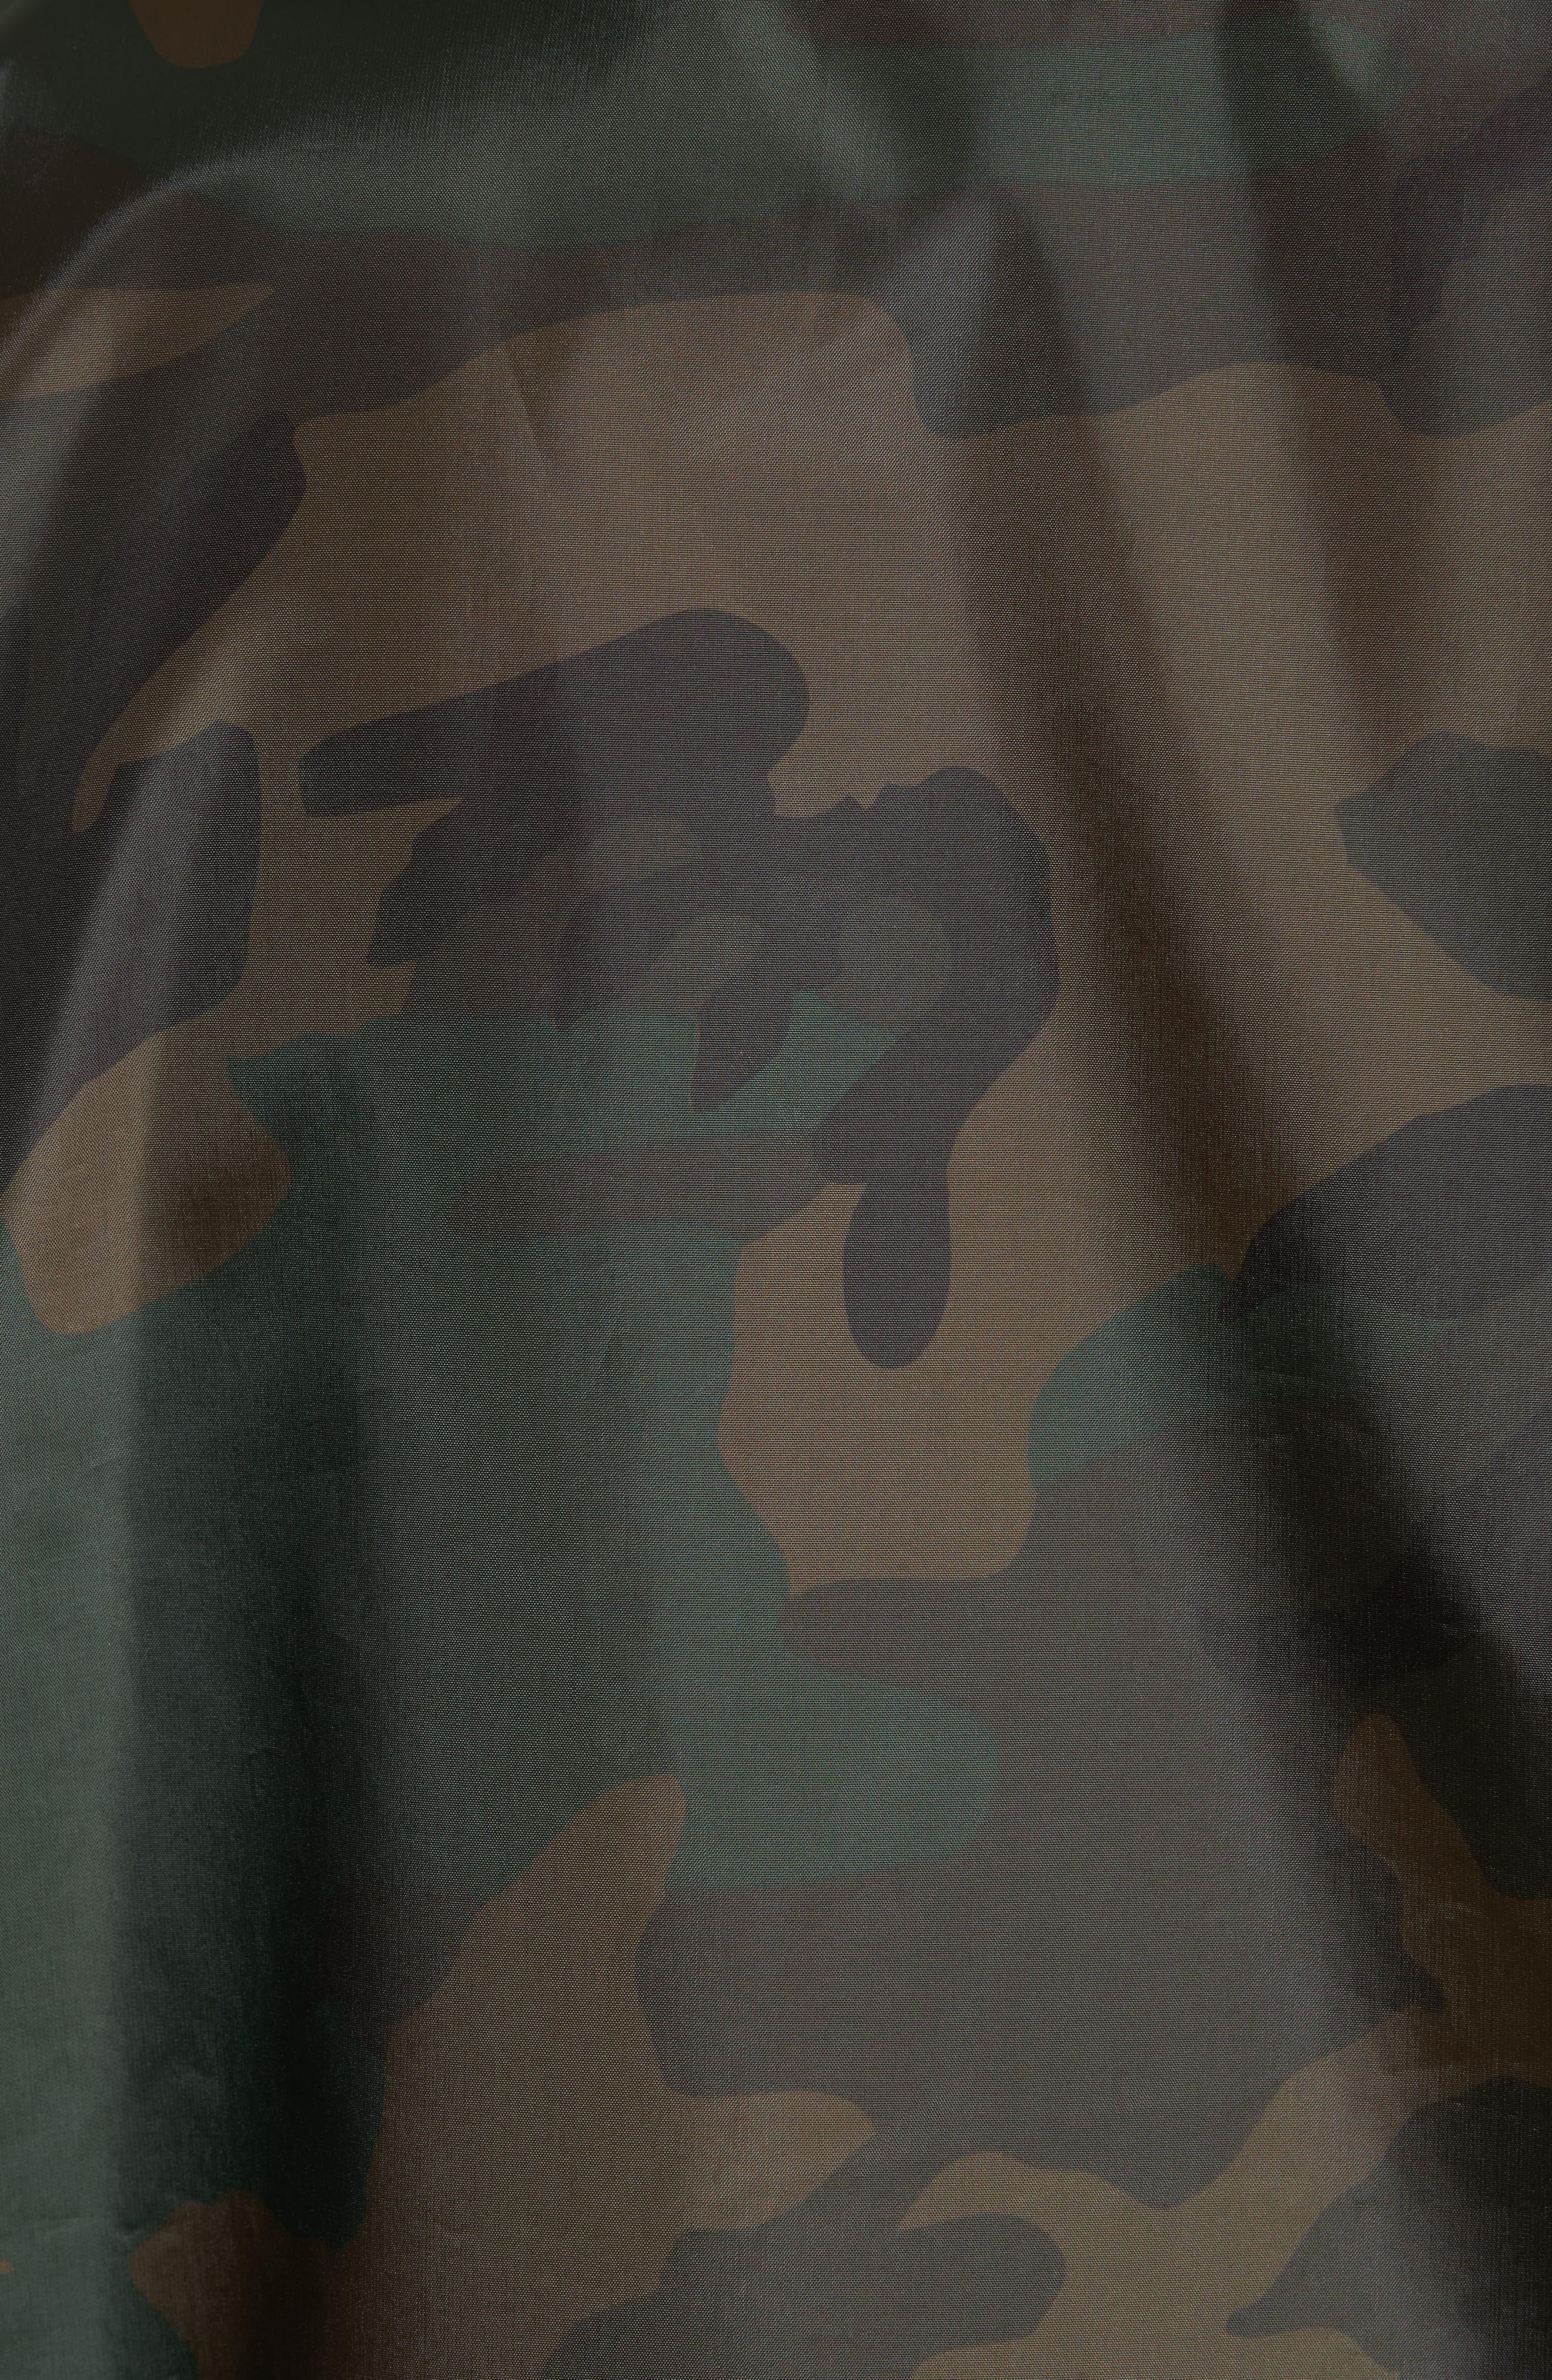 Camo Print Coach Jacket,                             Alternate thumbnail 5, color,                             Camo Combat Green/White